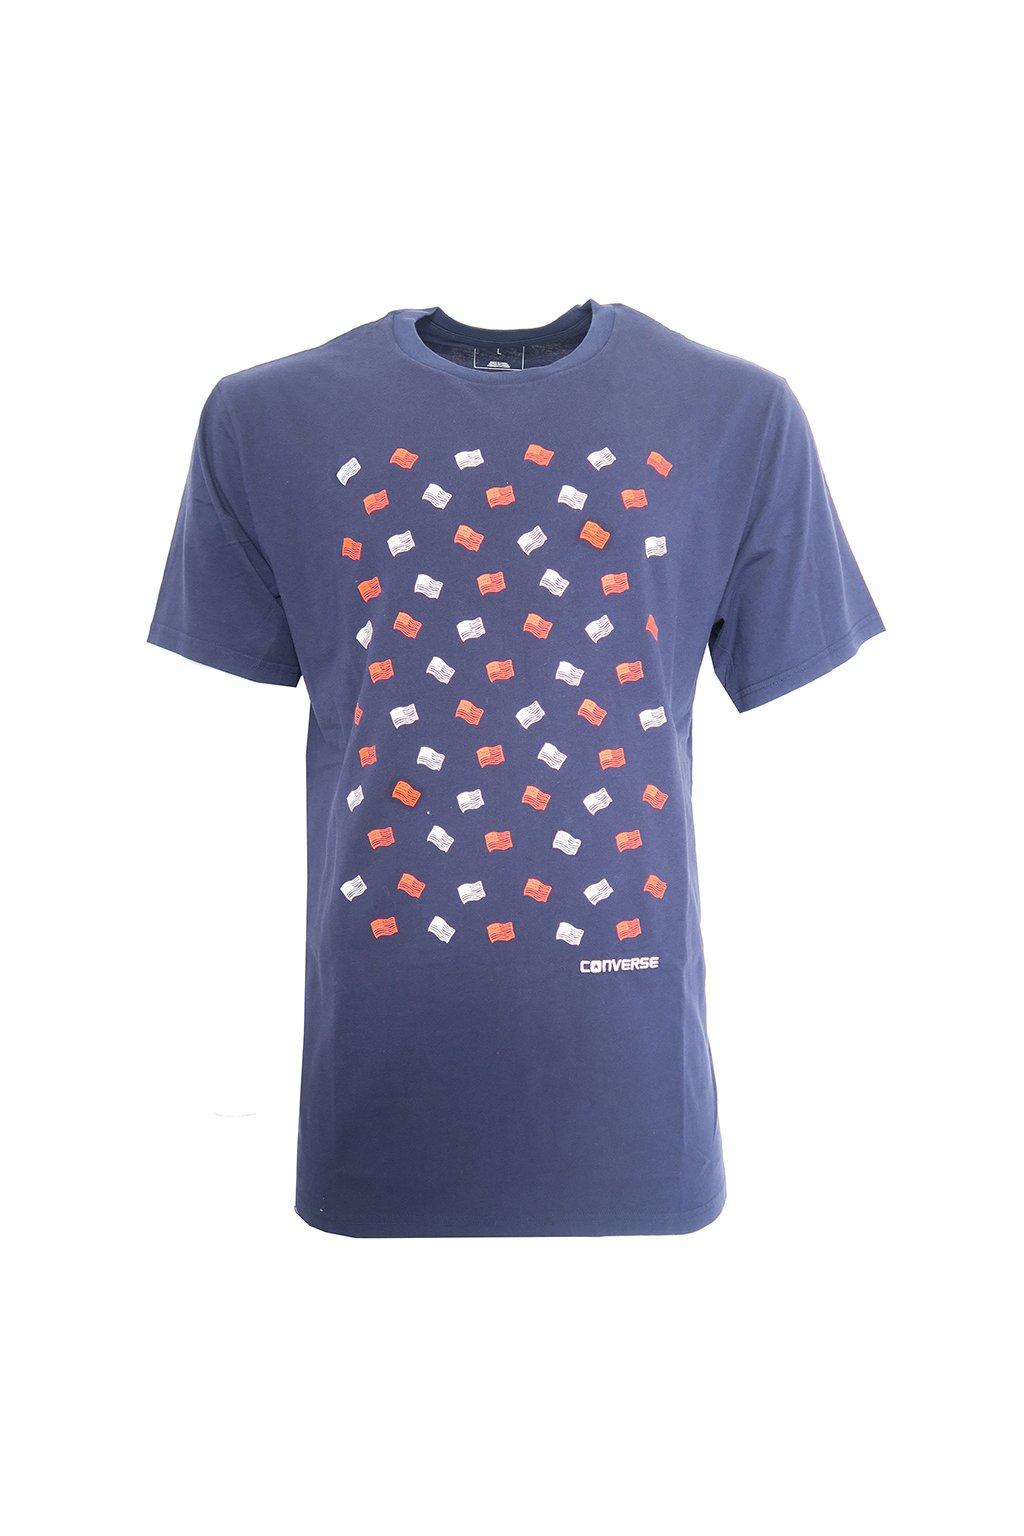 Modré triko s potiskem vlajek Converse